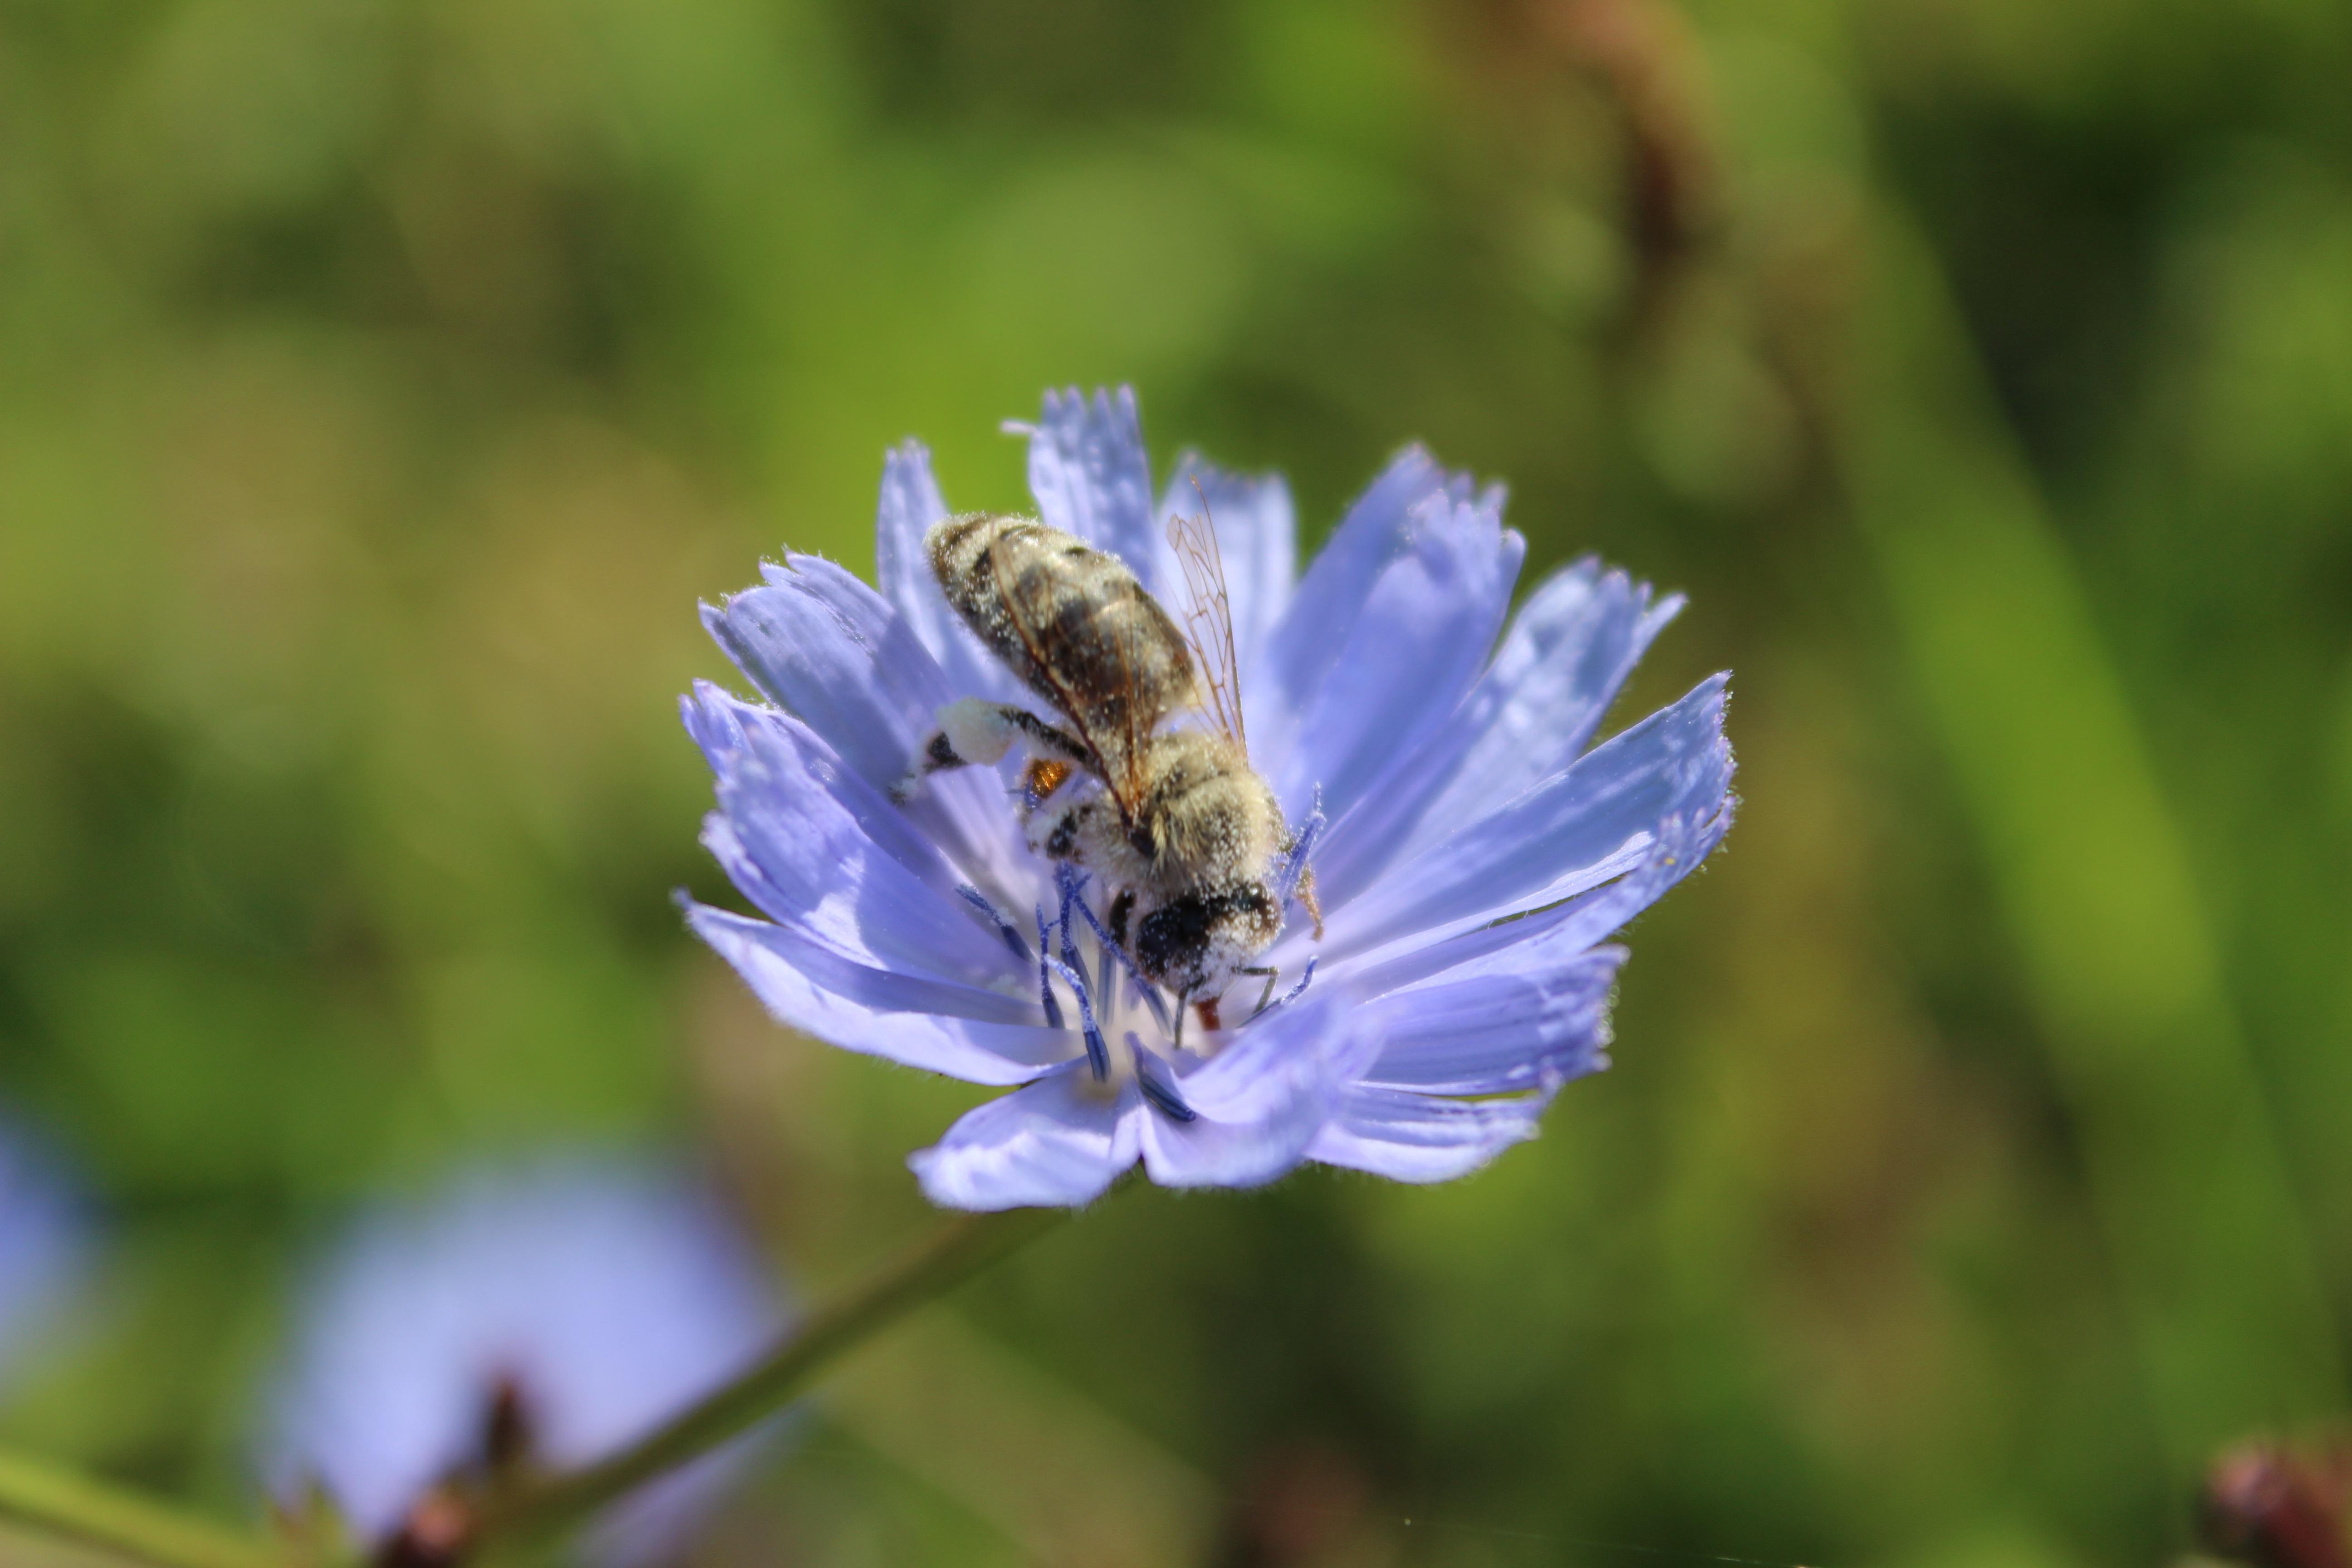 Free Images Nature Blossom Meadow Flower Petal Pollen Spring Herb Produce Botany Garden Closeup Flora Fauna Invertebrate Wildflower